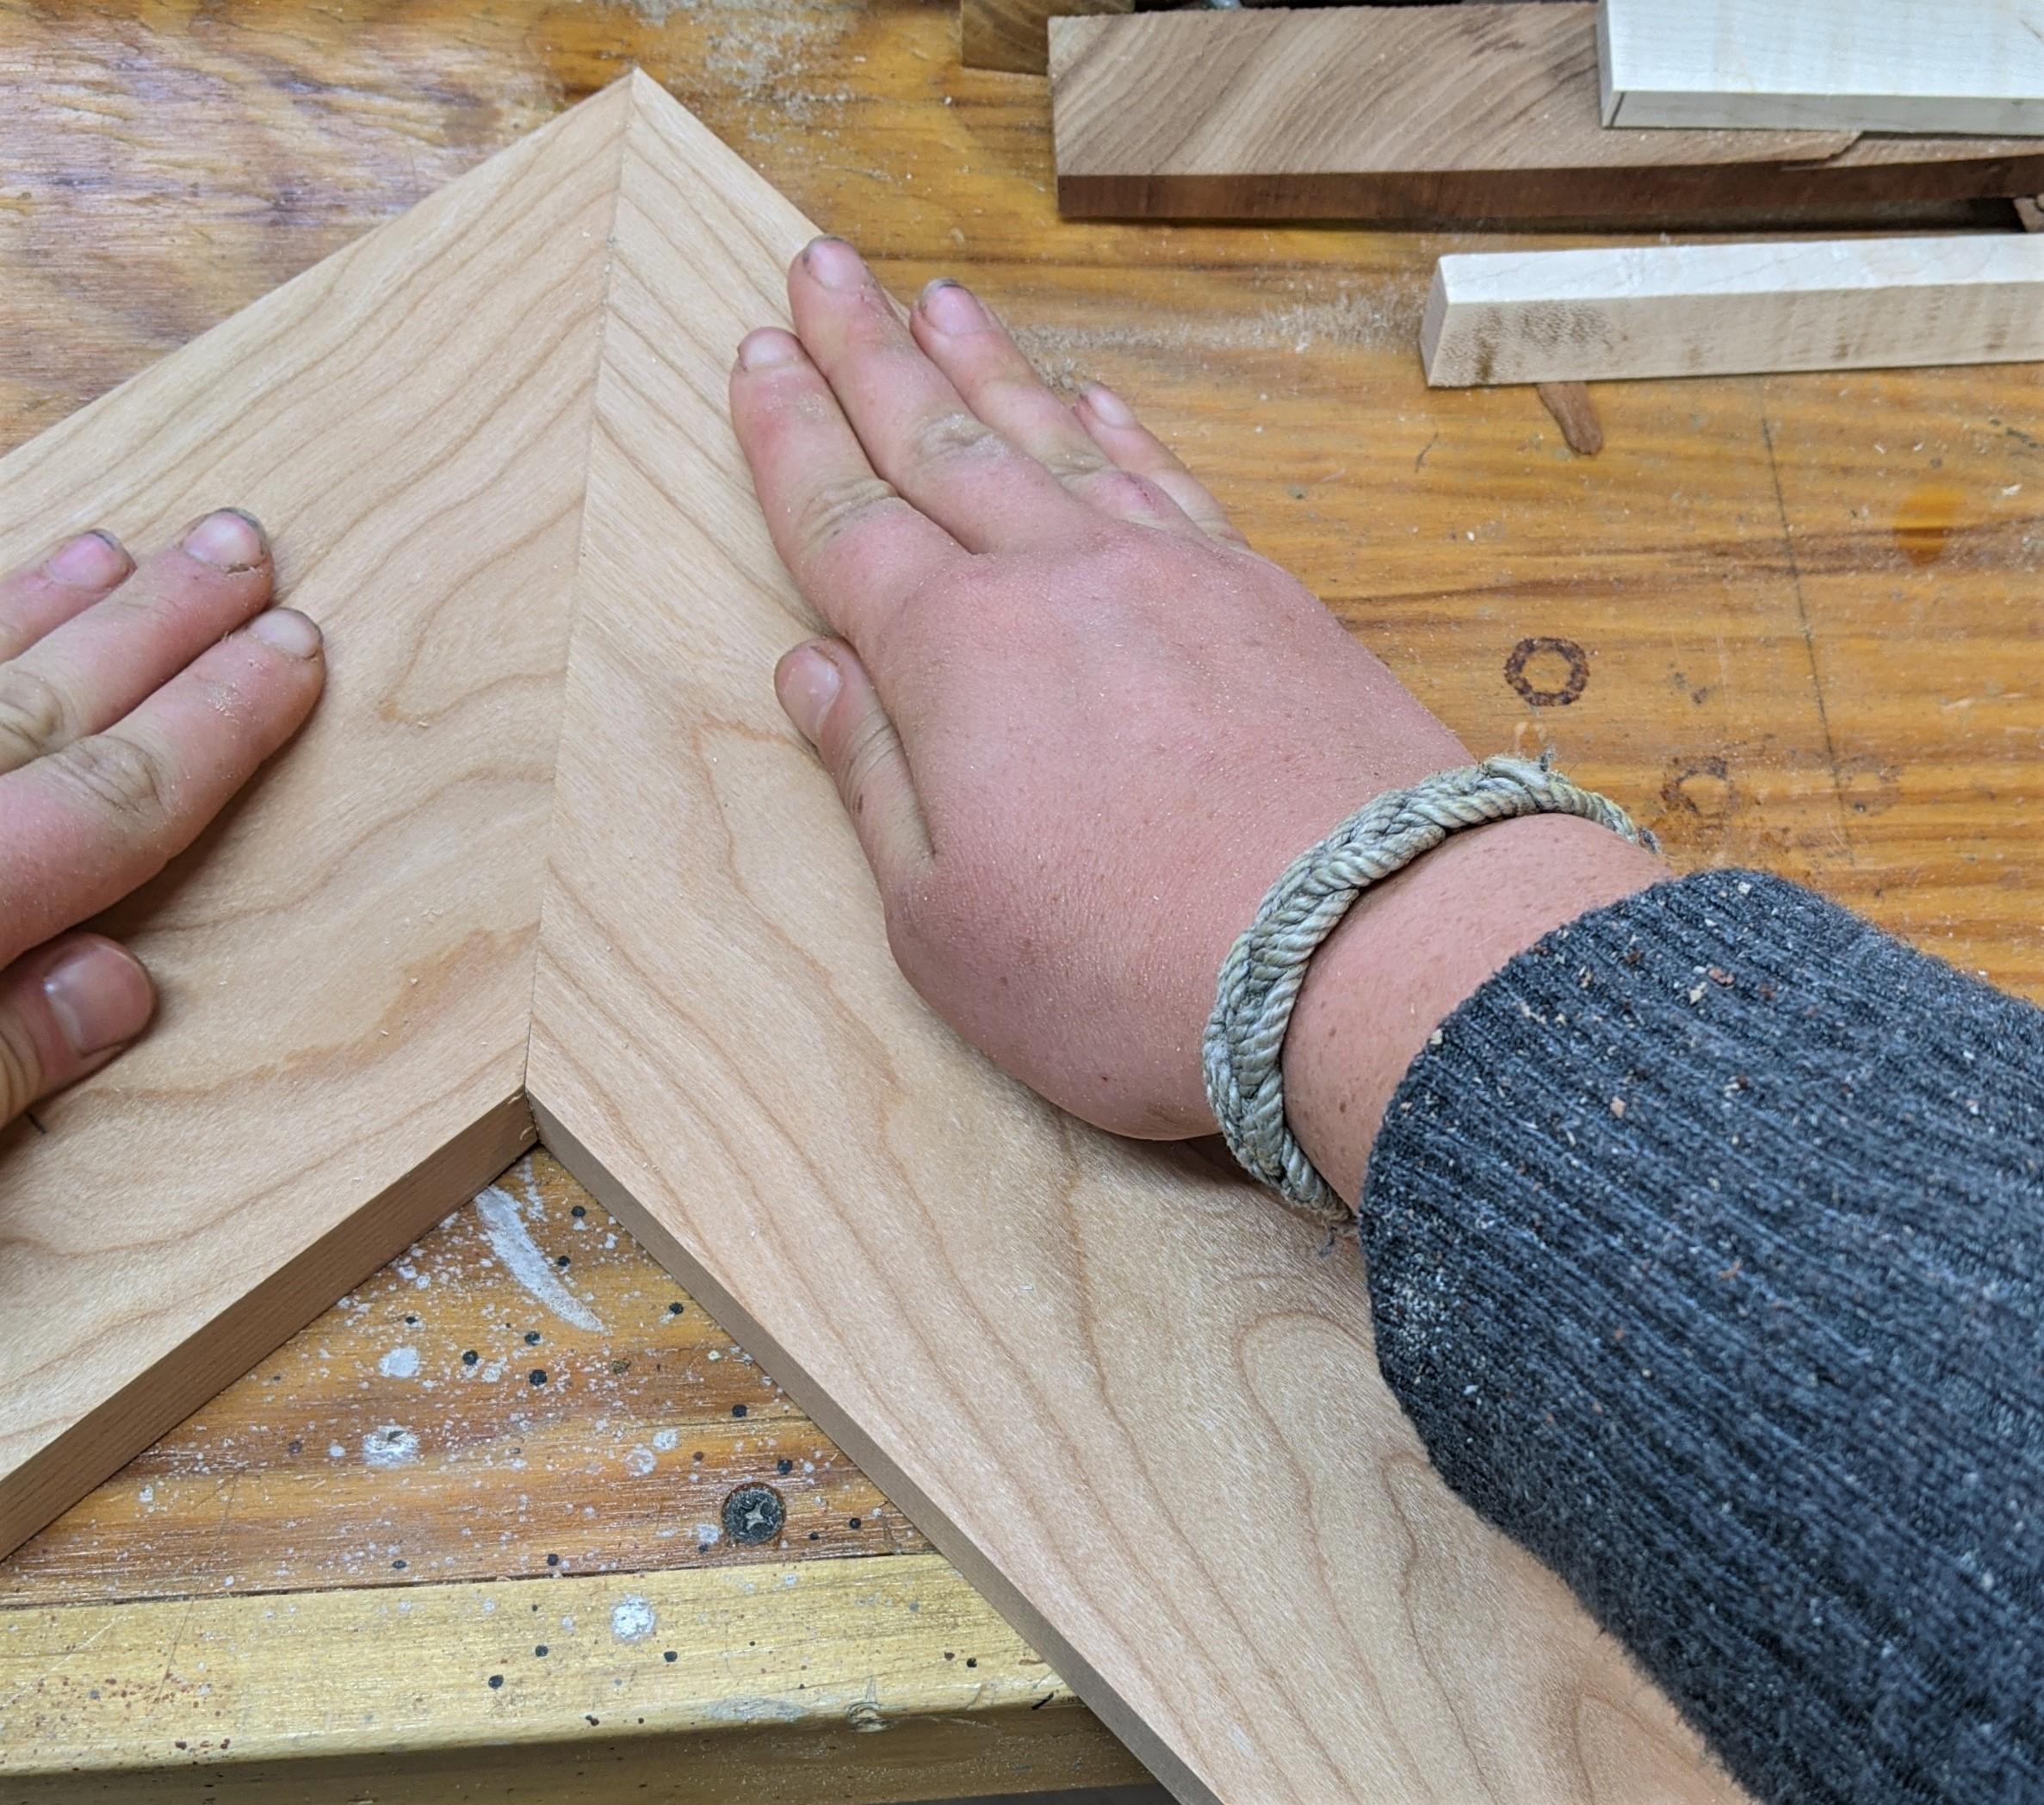 measure and cut shelves